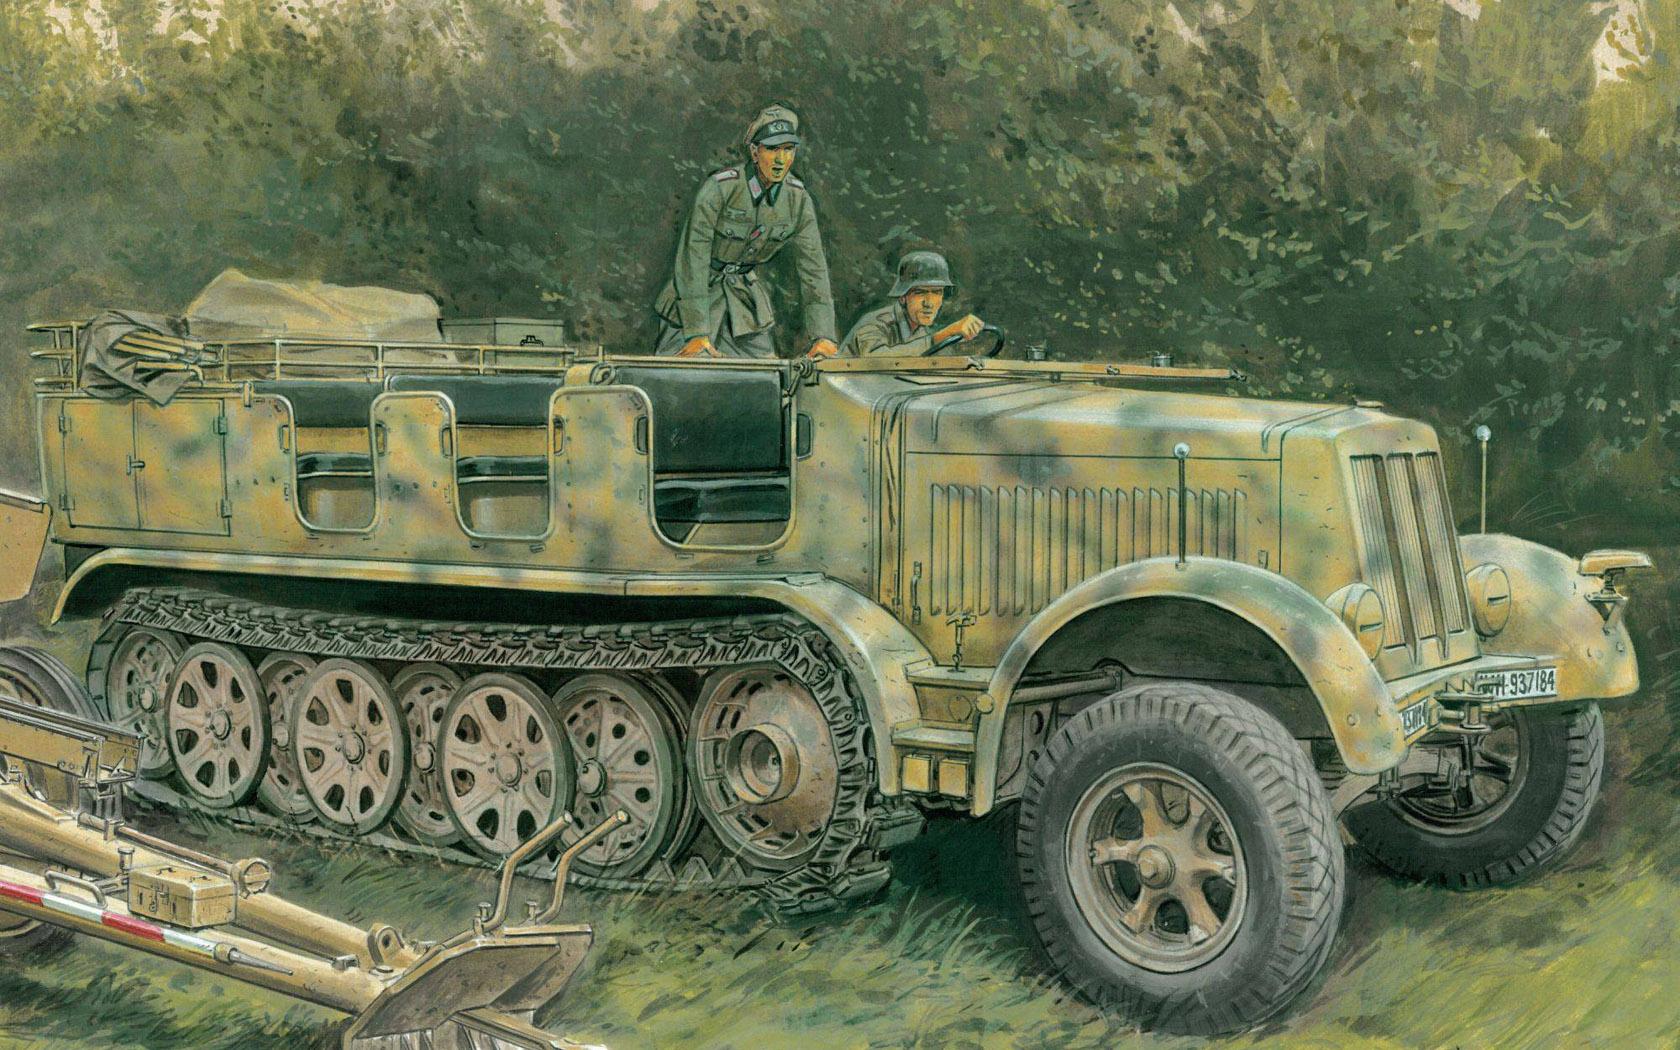 Volstad Ronald. Полугусеничный транспортер Sd.Kfz.7 8(t).